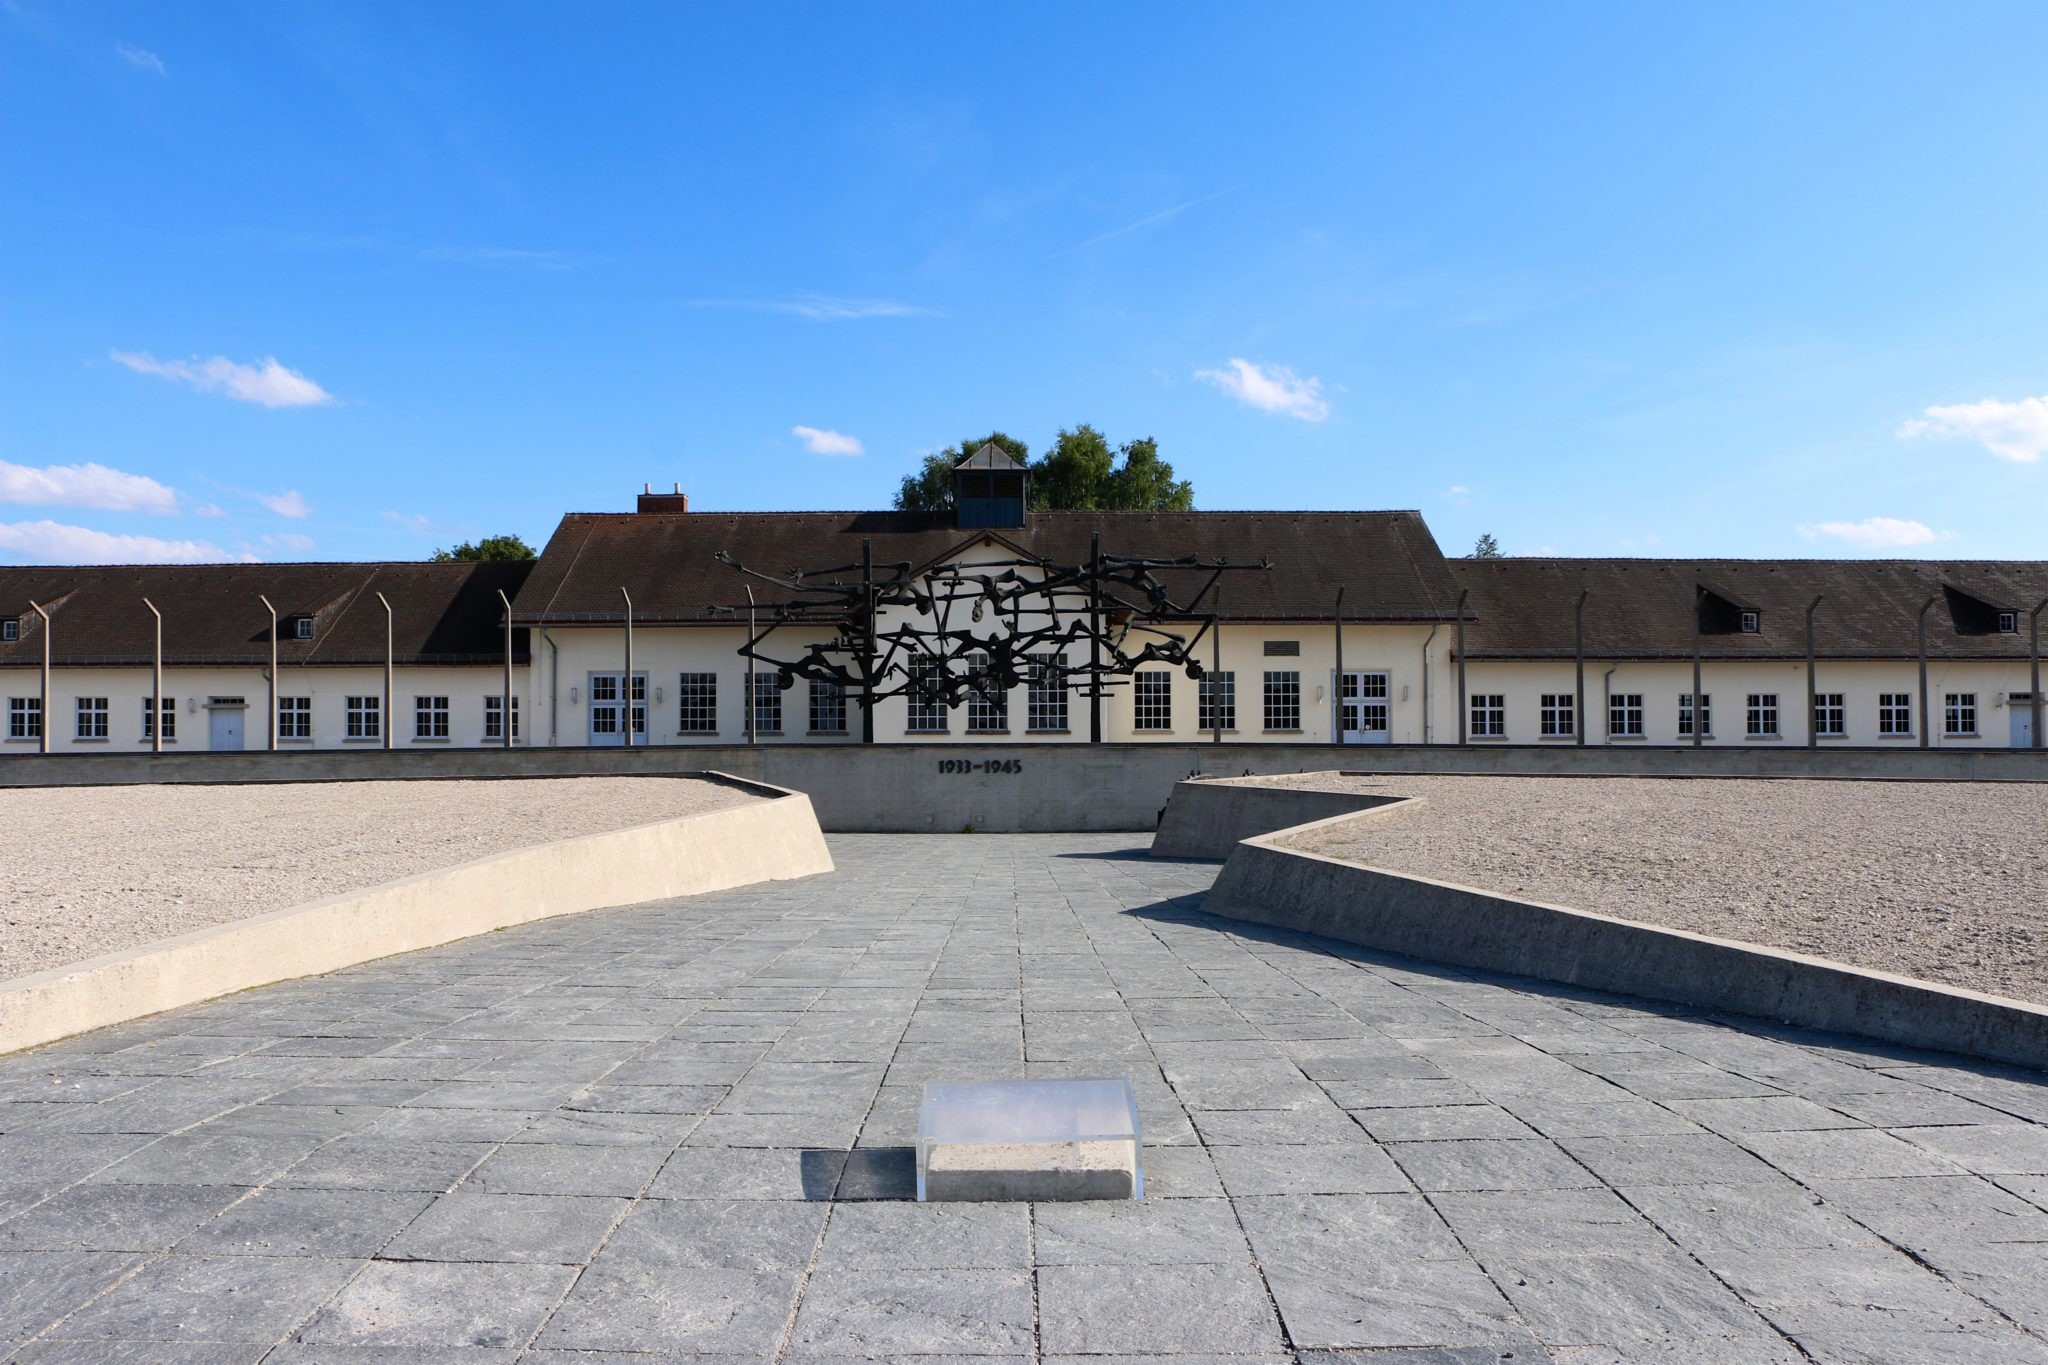 Dachau Concentration Camp │ Germany